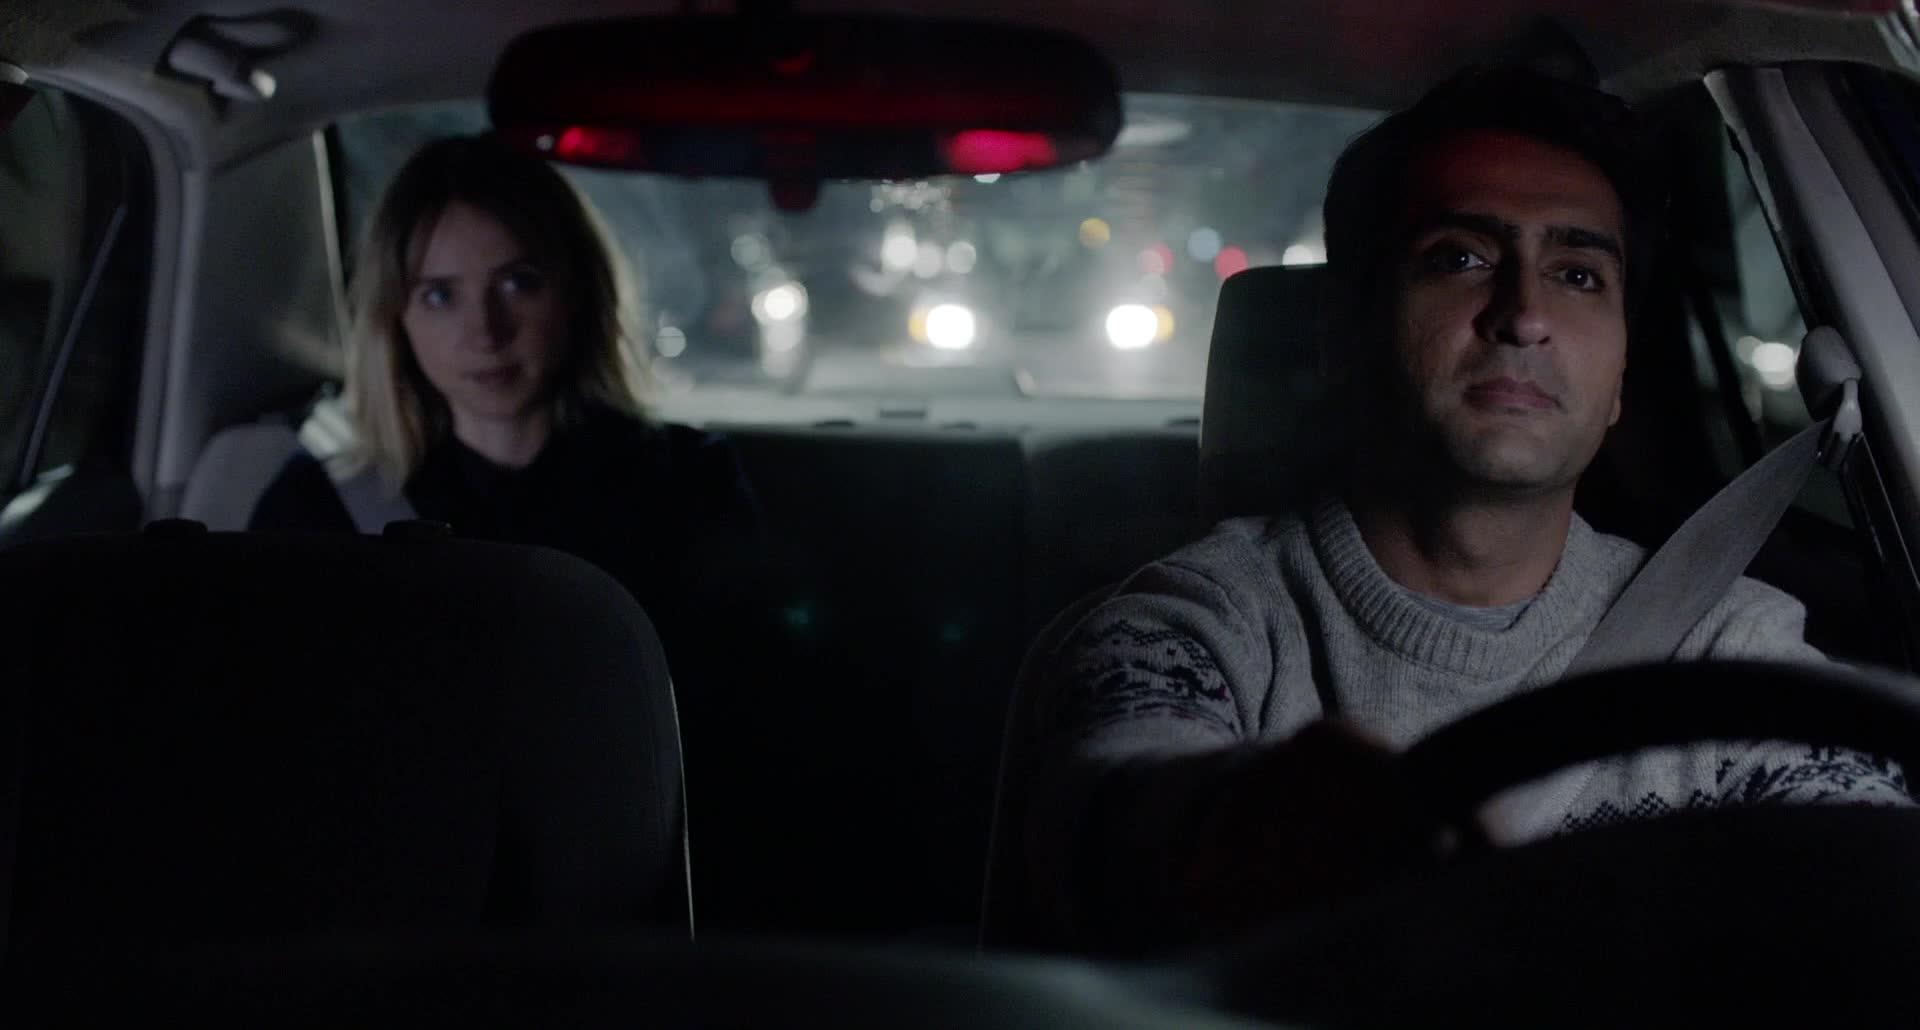 Lionsgate, Romance, The Big Sick, TheBigSick, comedy, lionsgate, movie, romance, romantic, the big sick, thebigsick, The awkward car ride GIFs